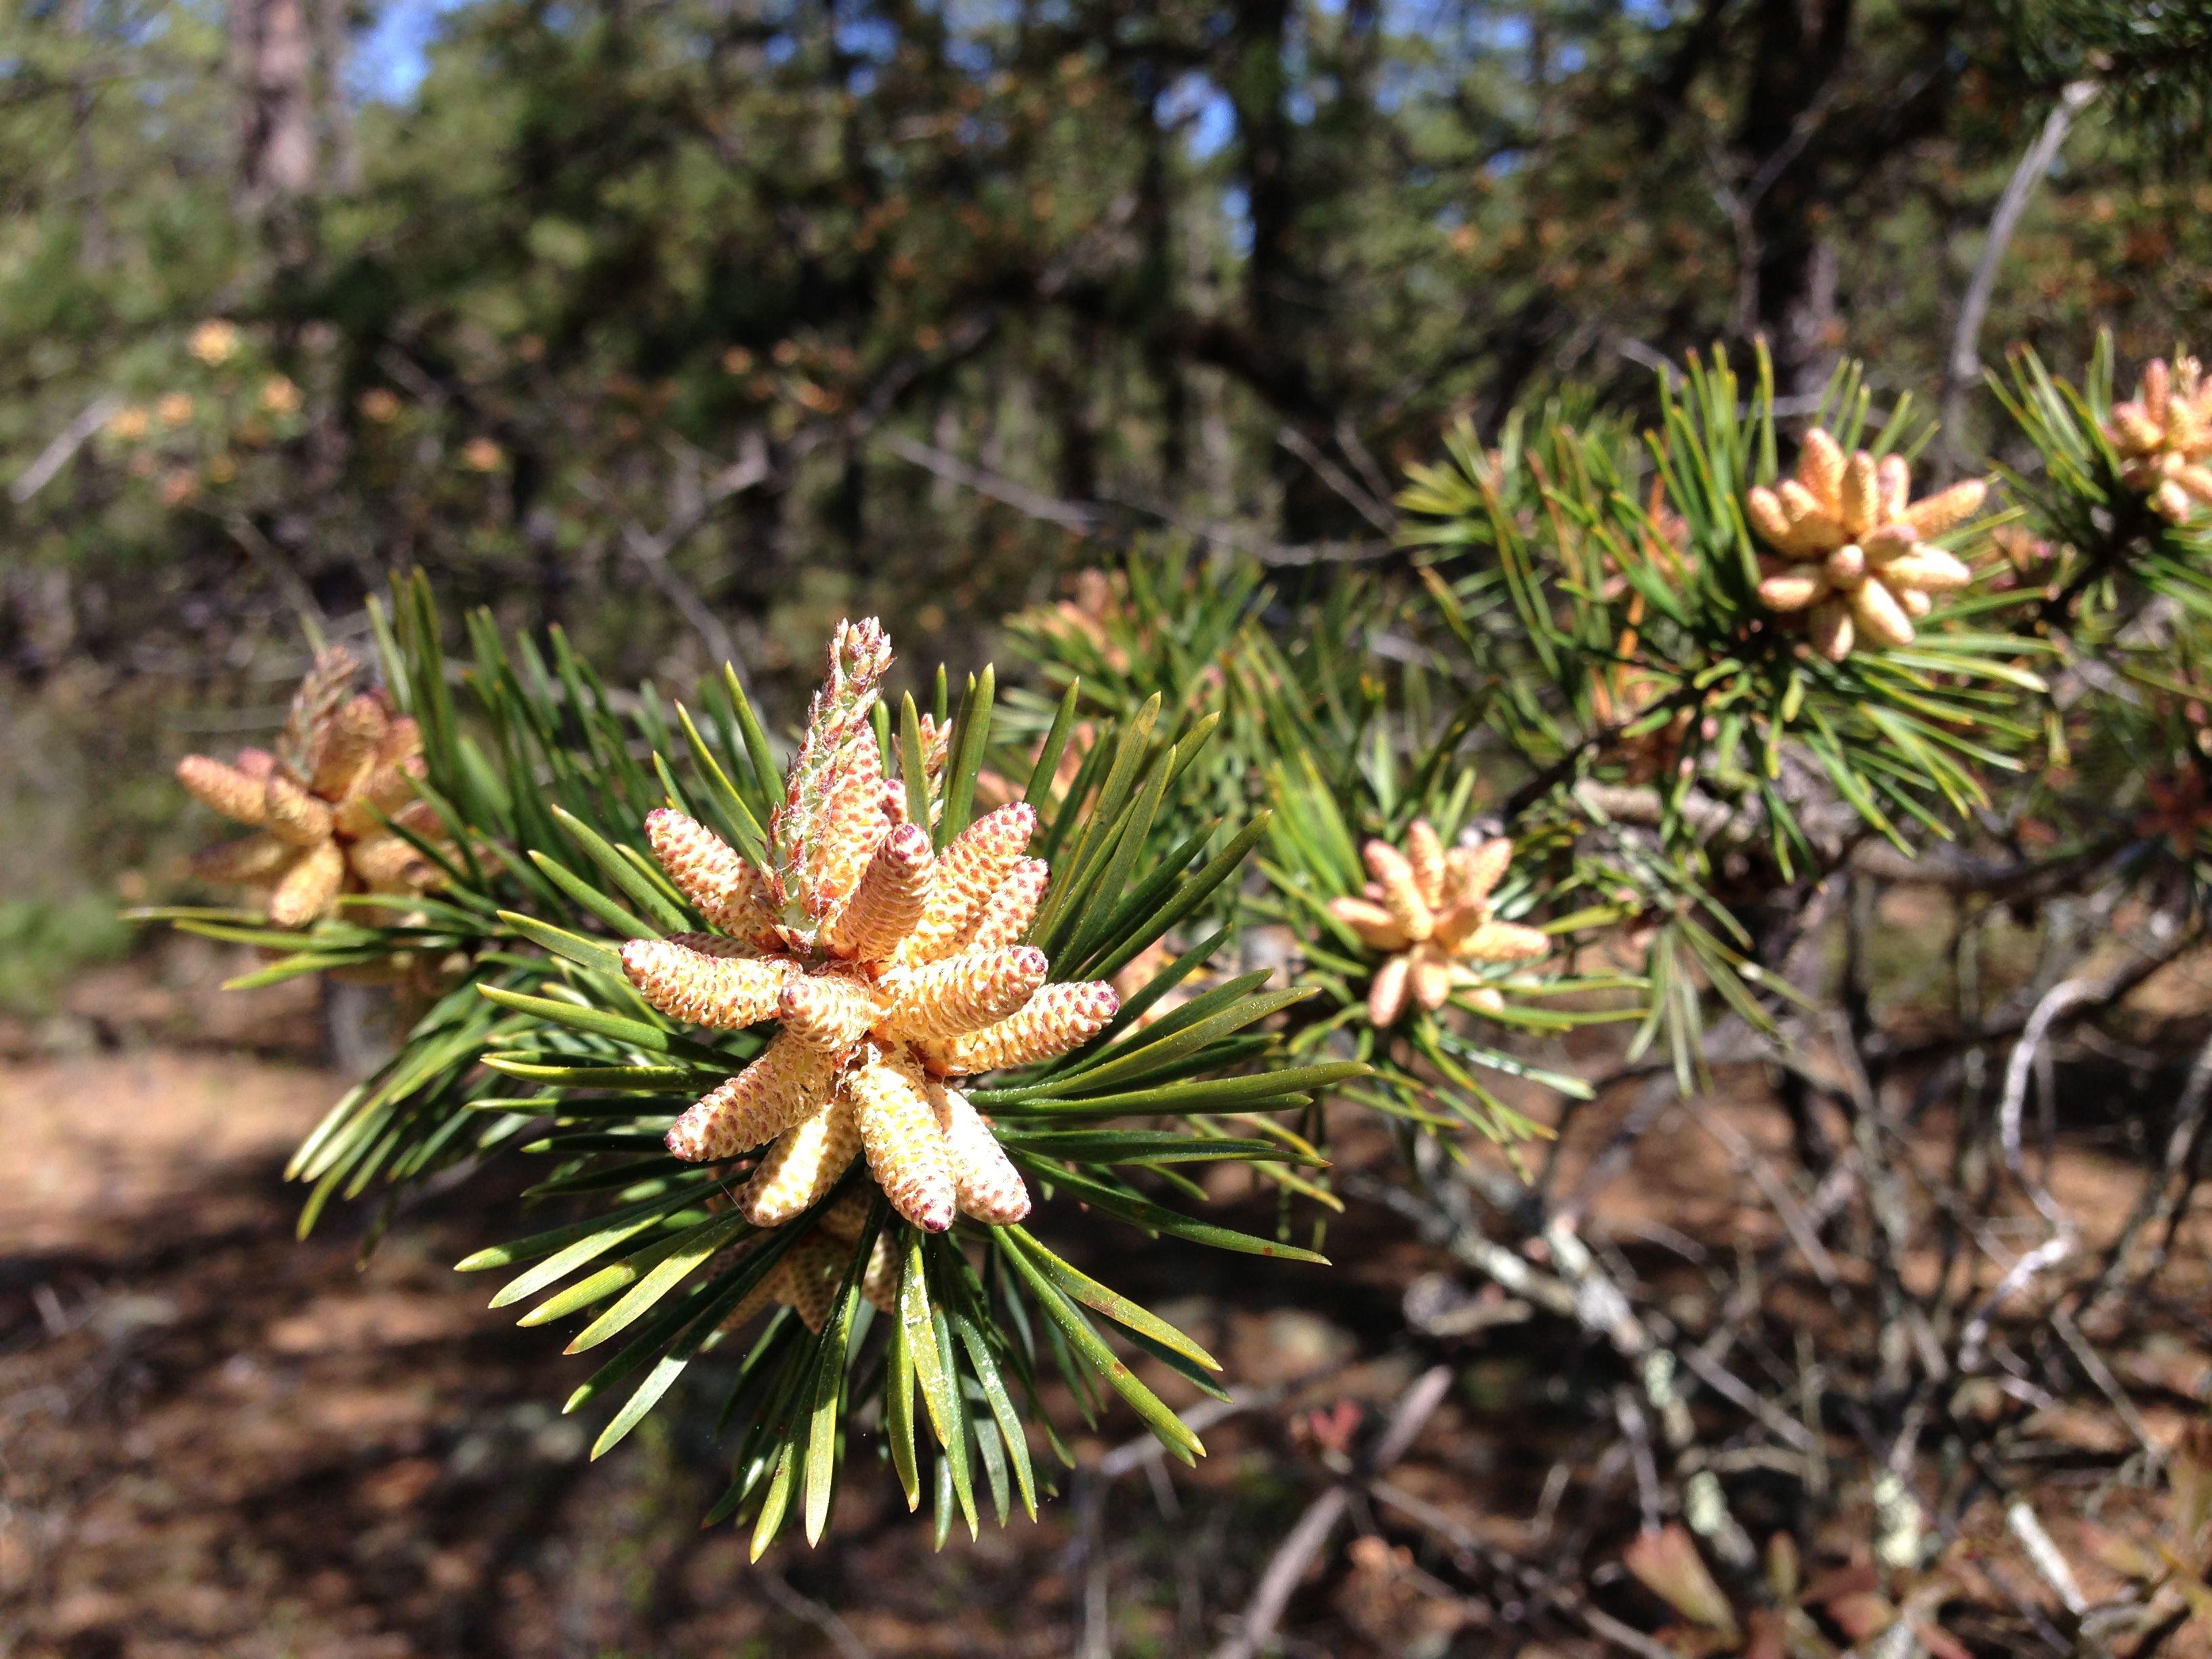 Virginia pine cones and needles